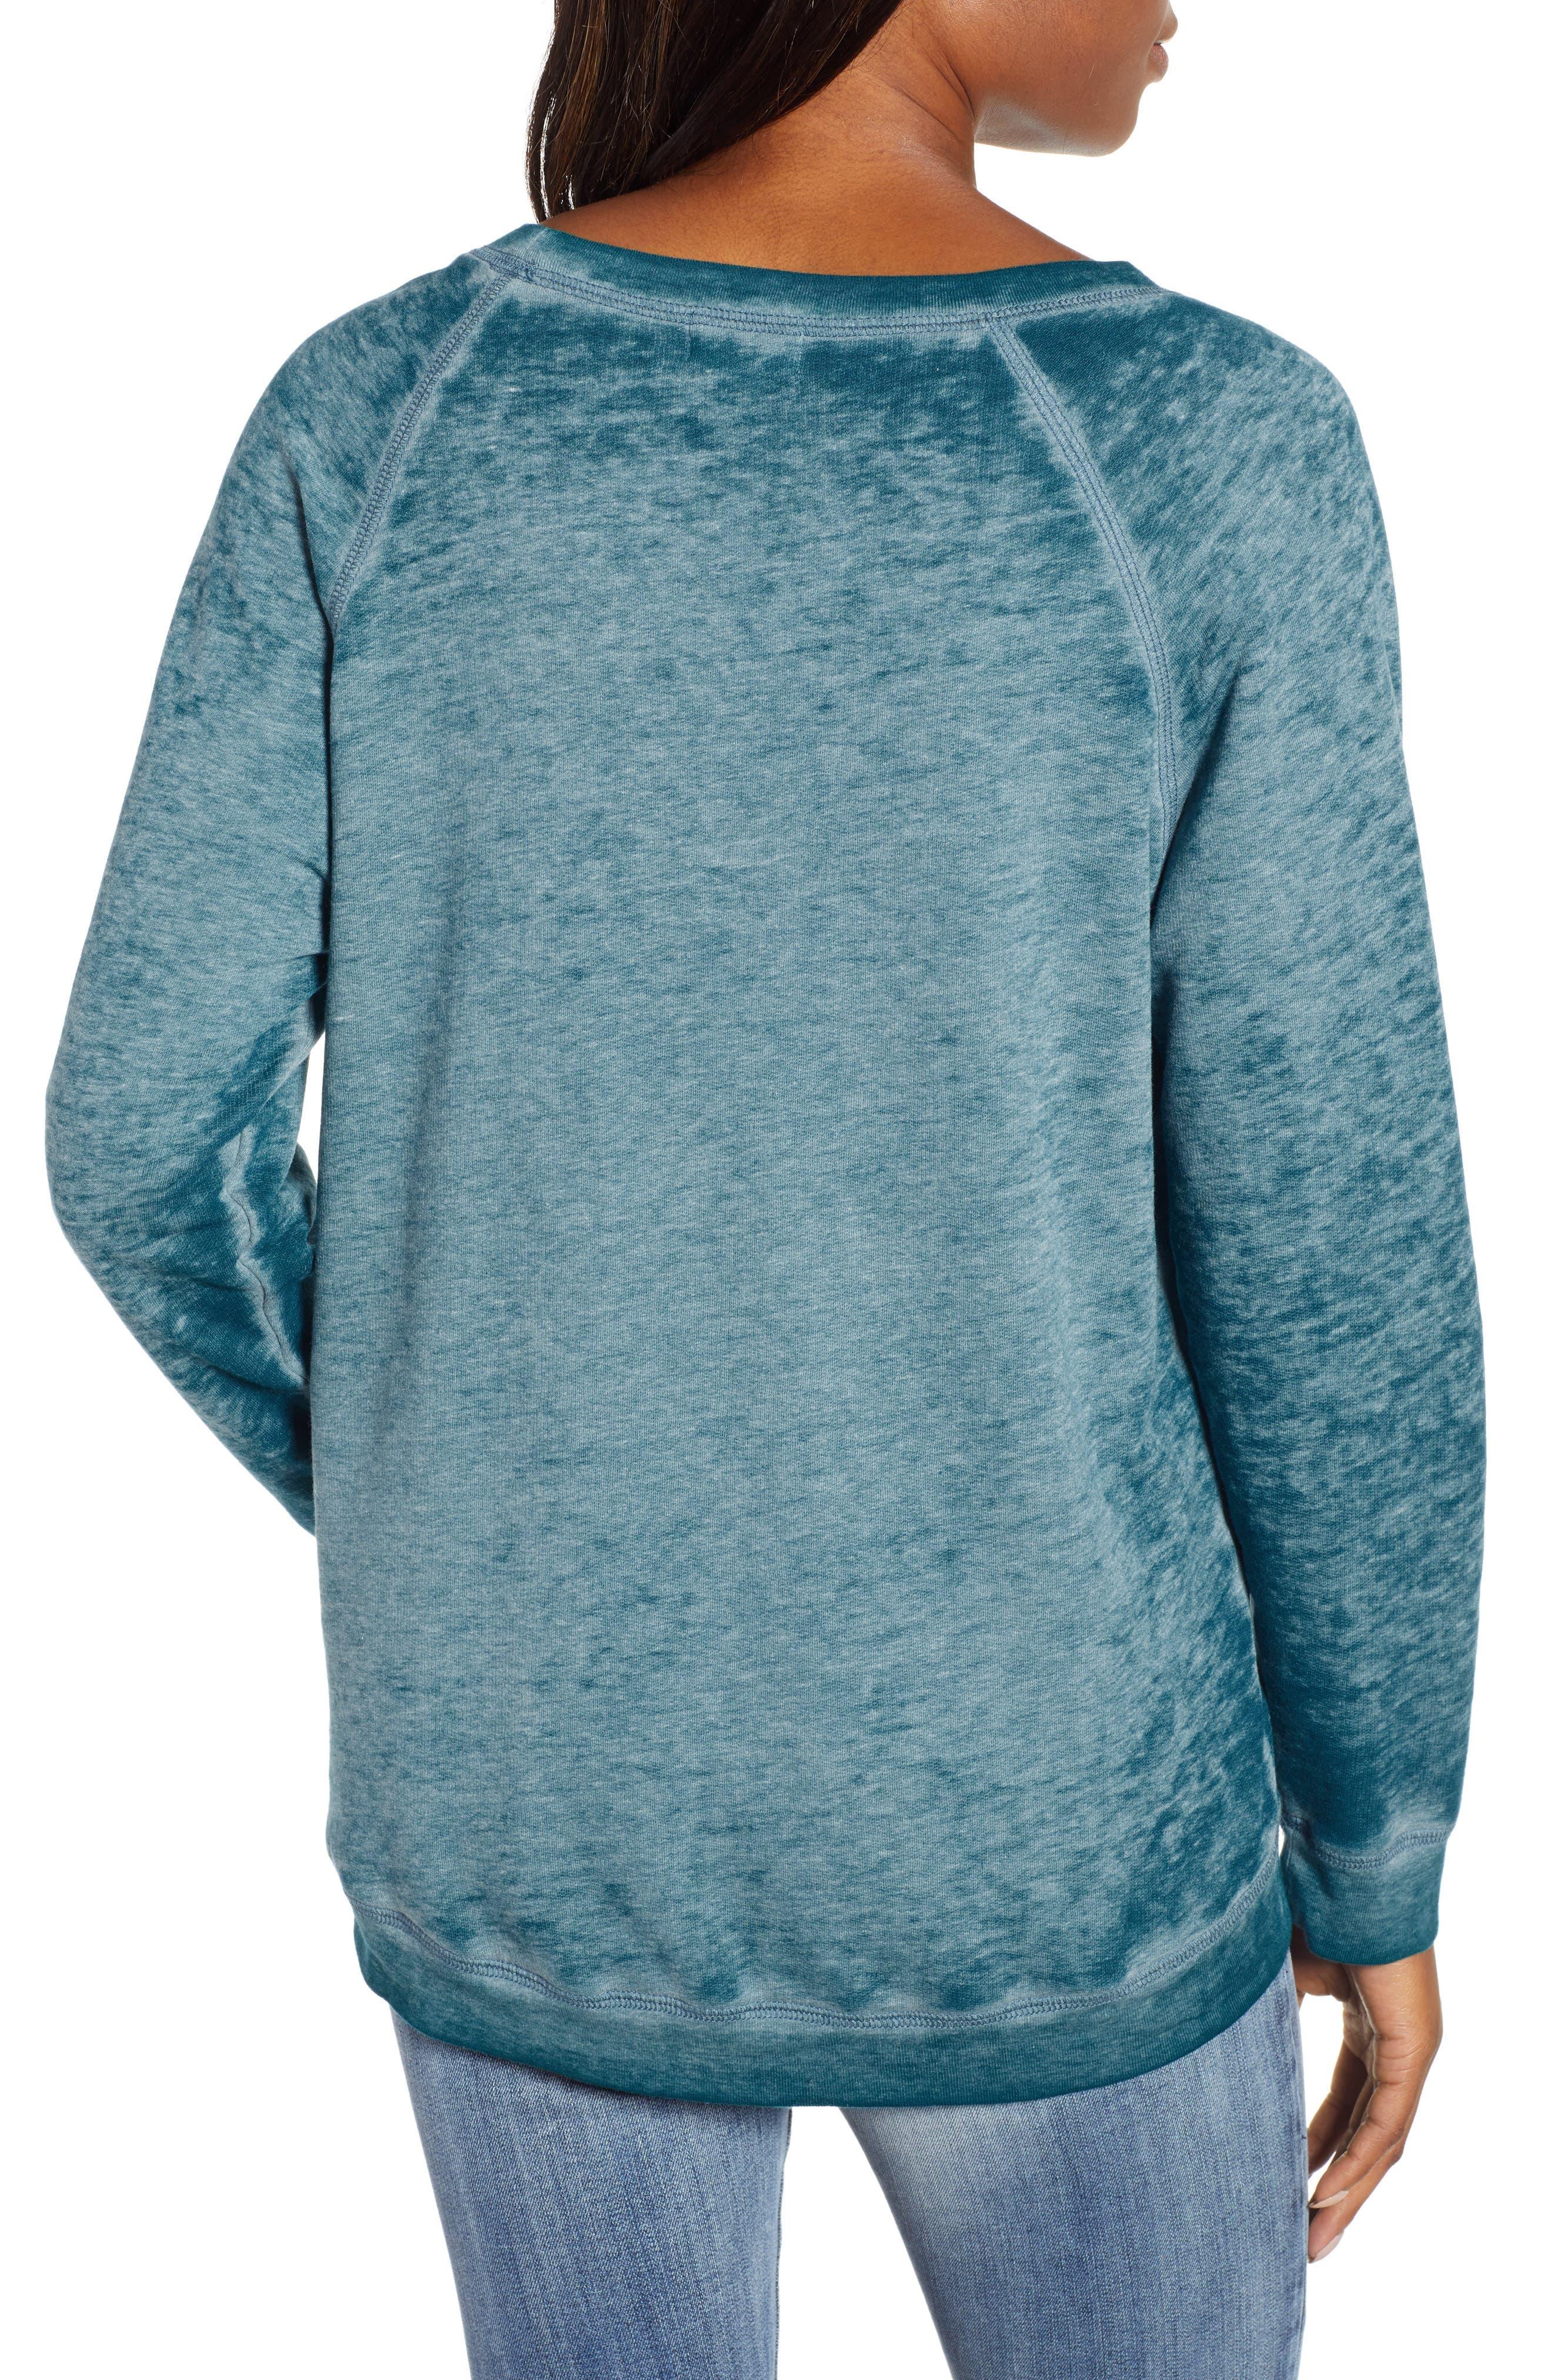 Burnout Sweatshirt,                             Alternate thumbnail 2, color,                             TEAL CORAL